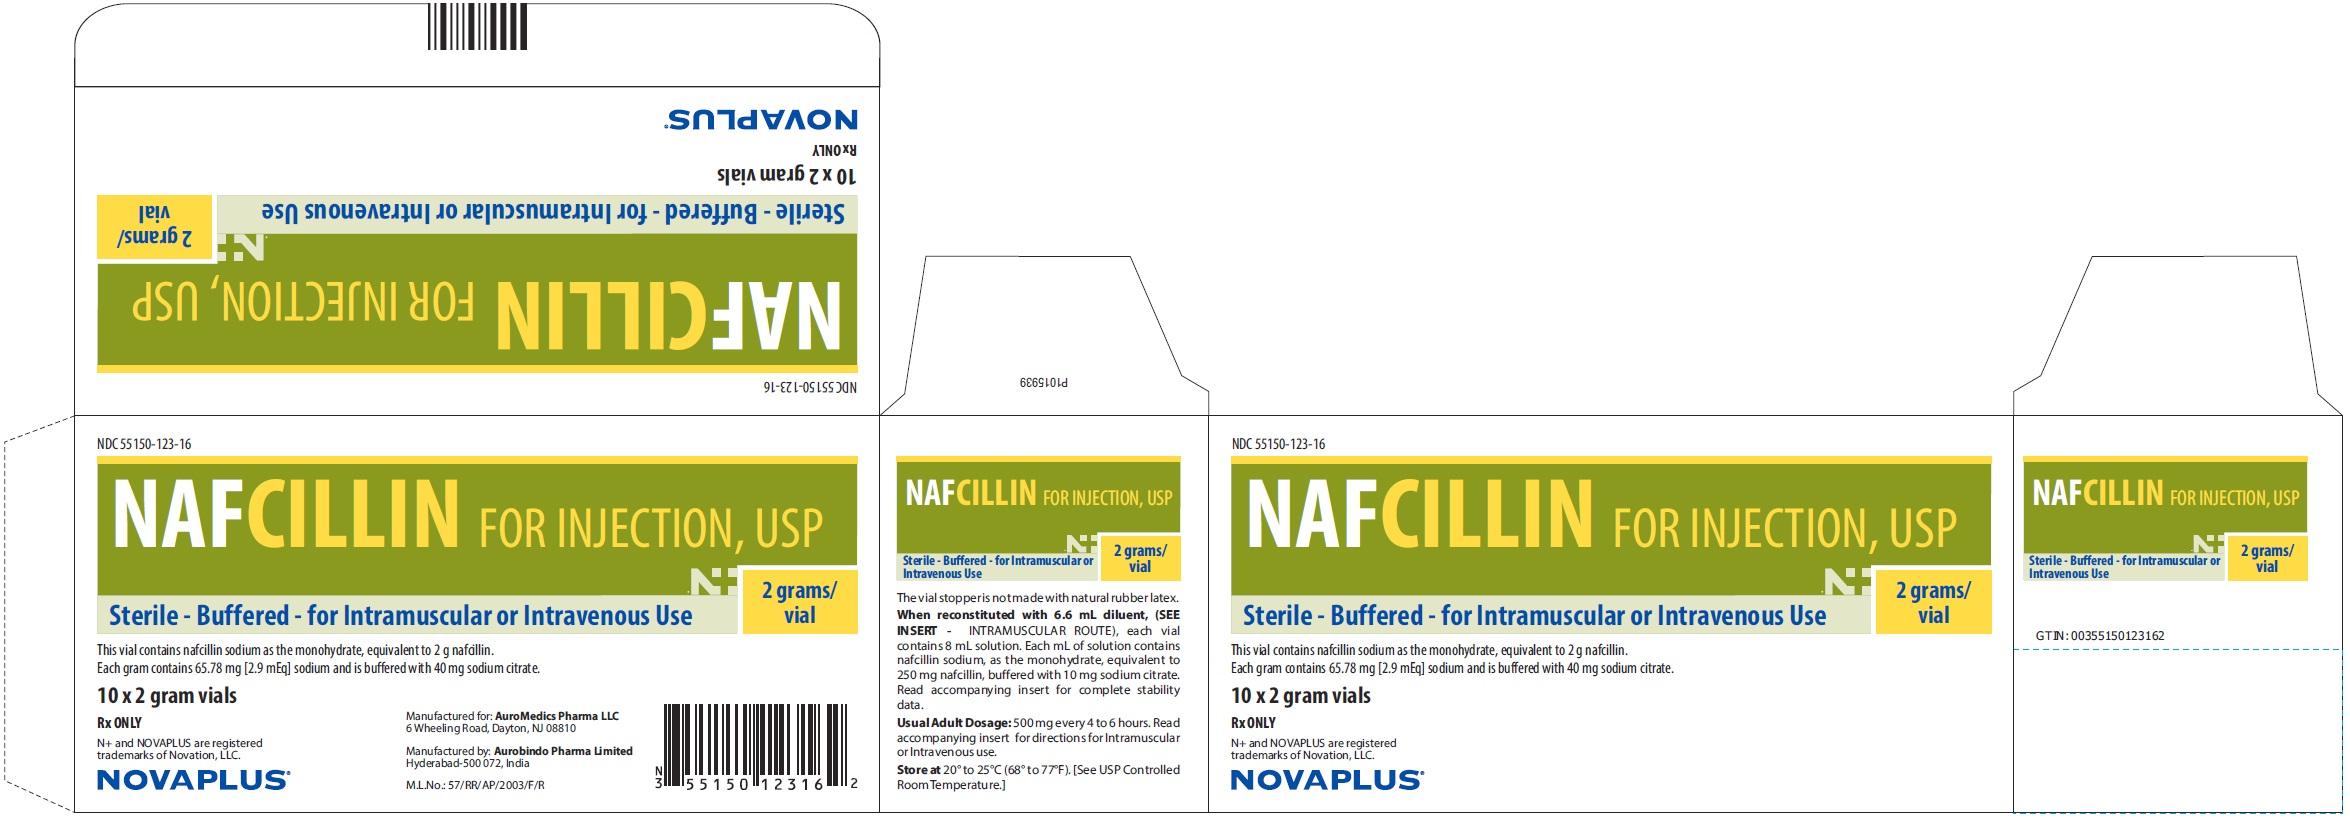 PACKAGE LABEL-PRINCIPAL DISPLAY PANEL - 2 g Box (10 Vial)